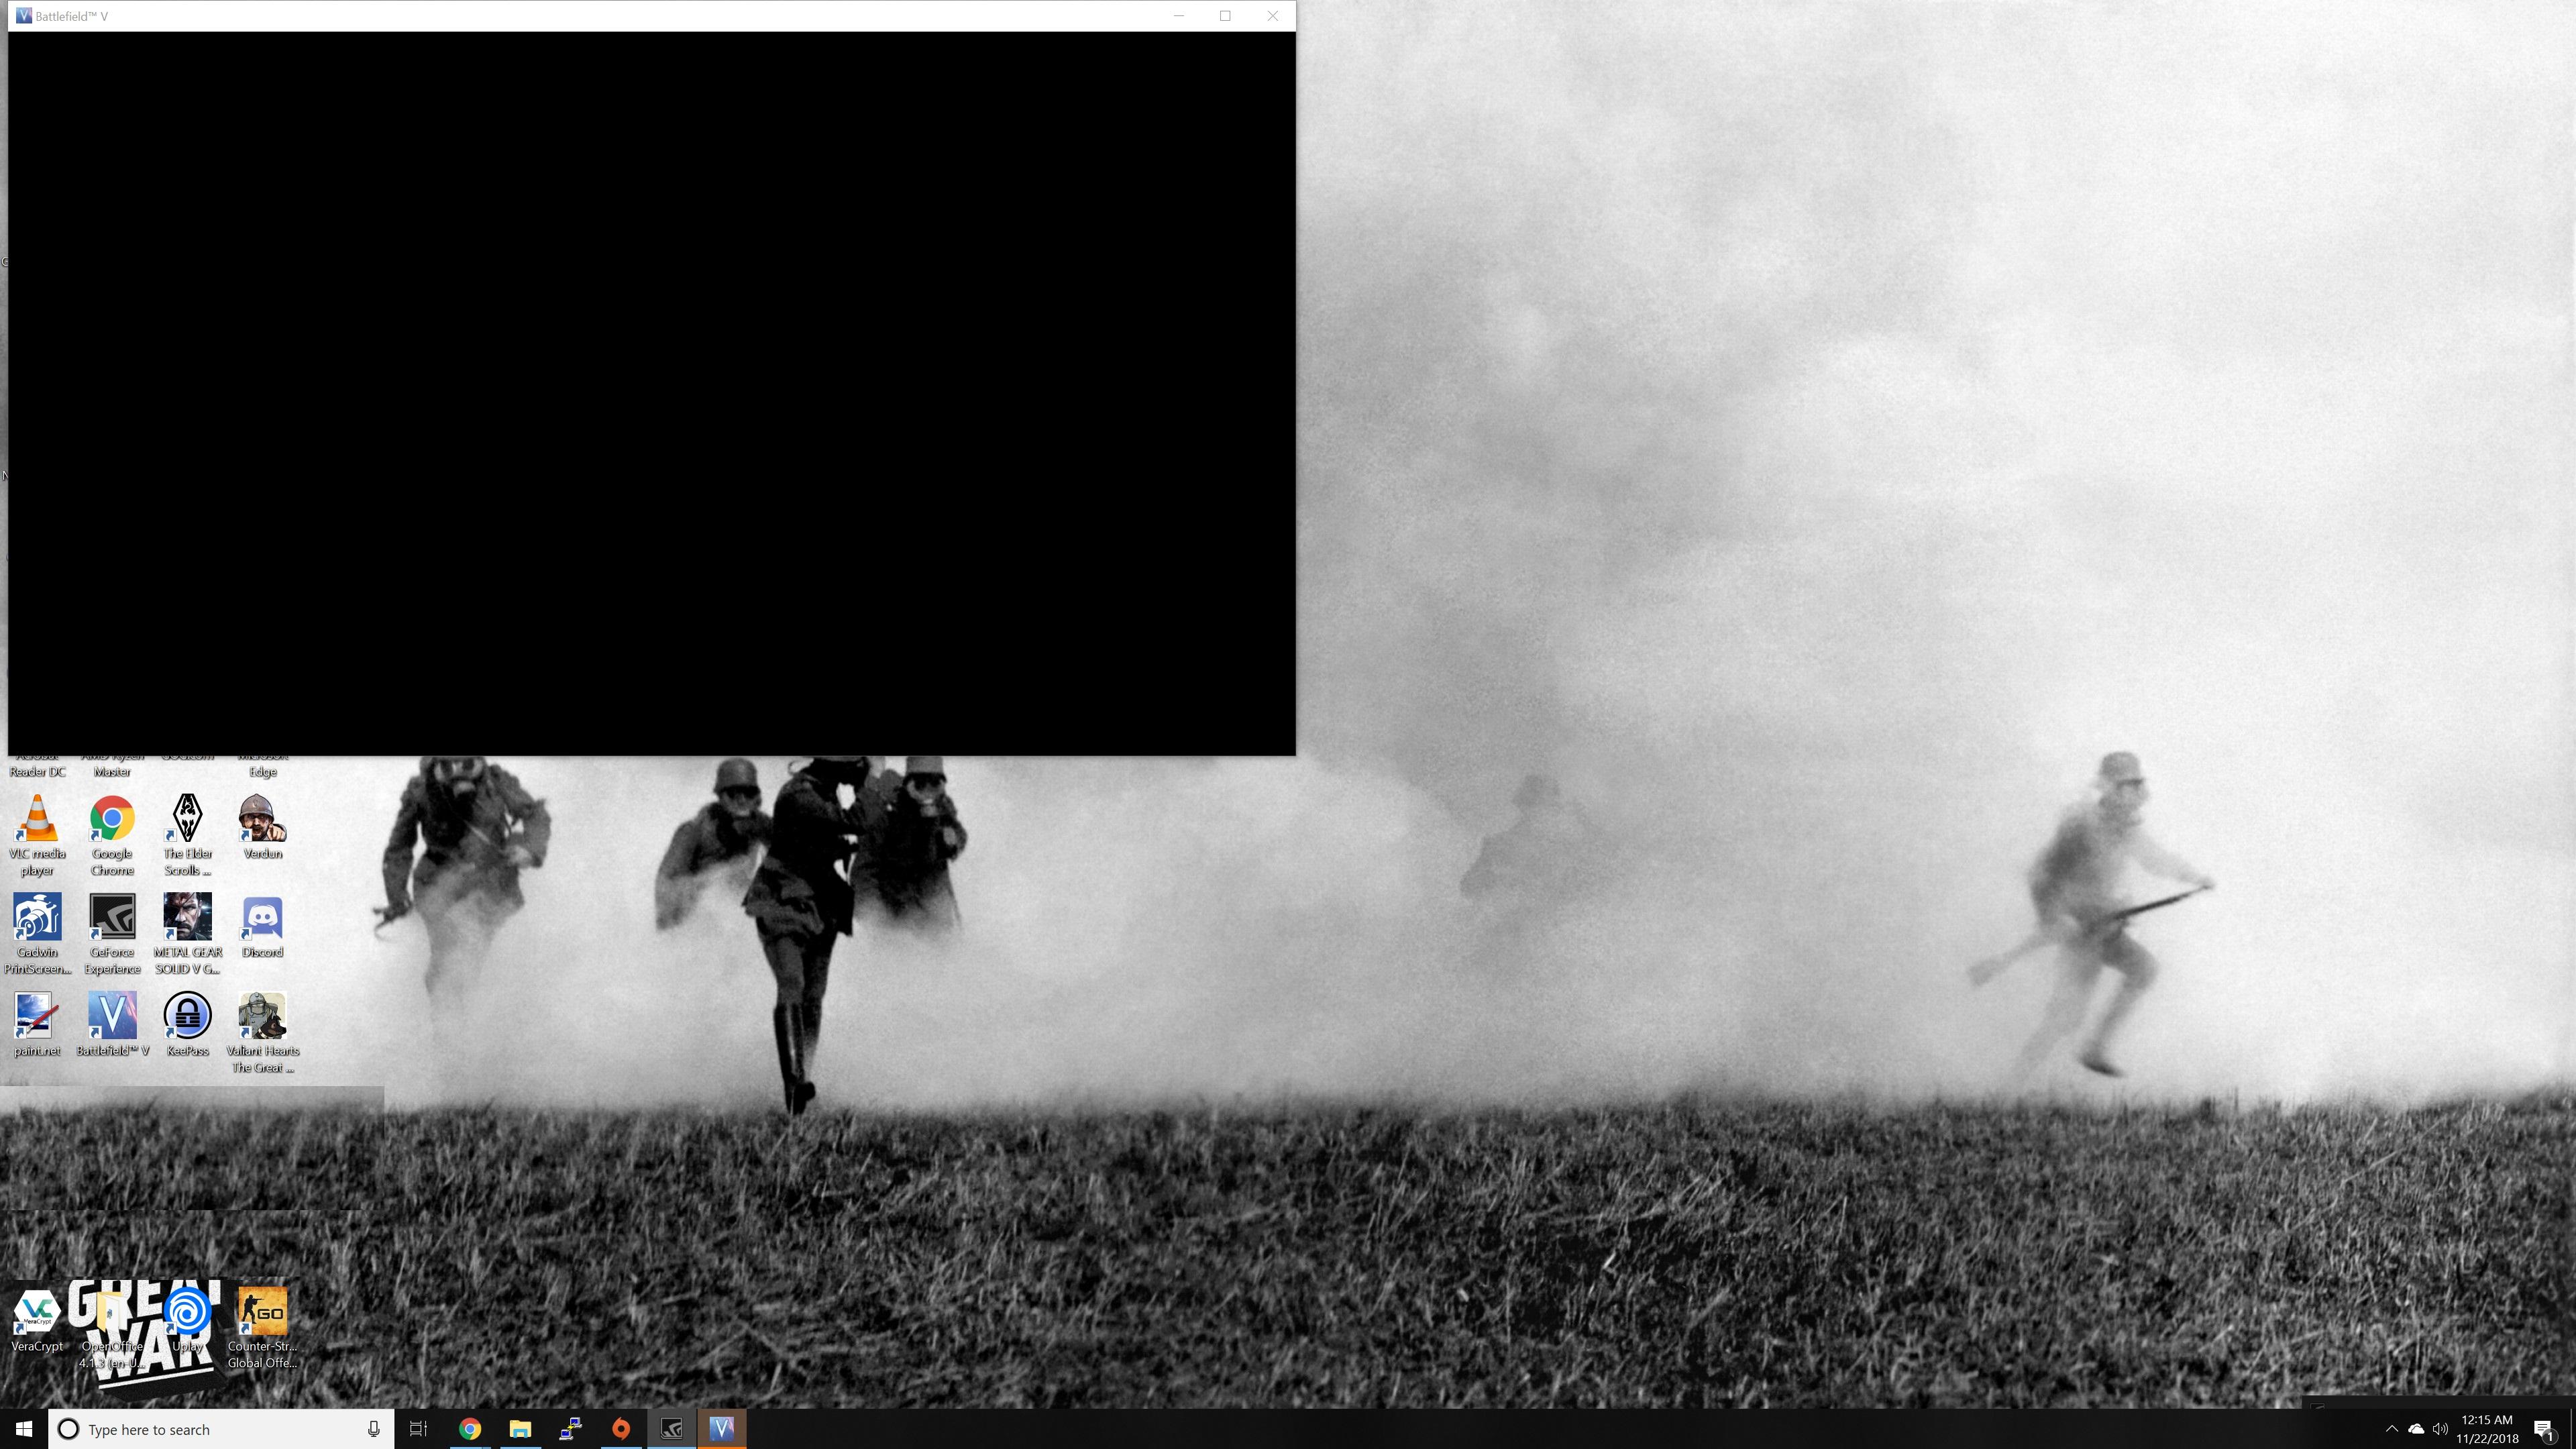 Battlefield 1 Black Screen When Joining Game | Gameswalls org